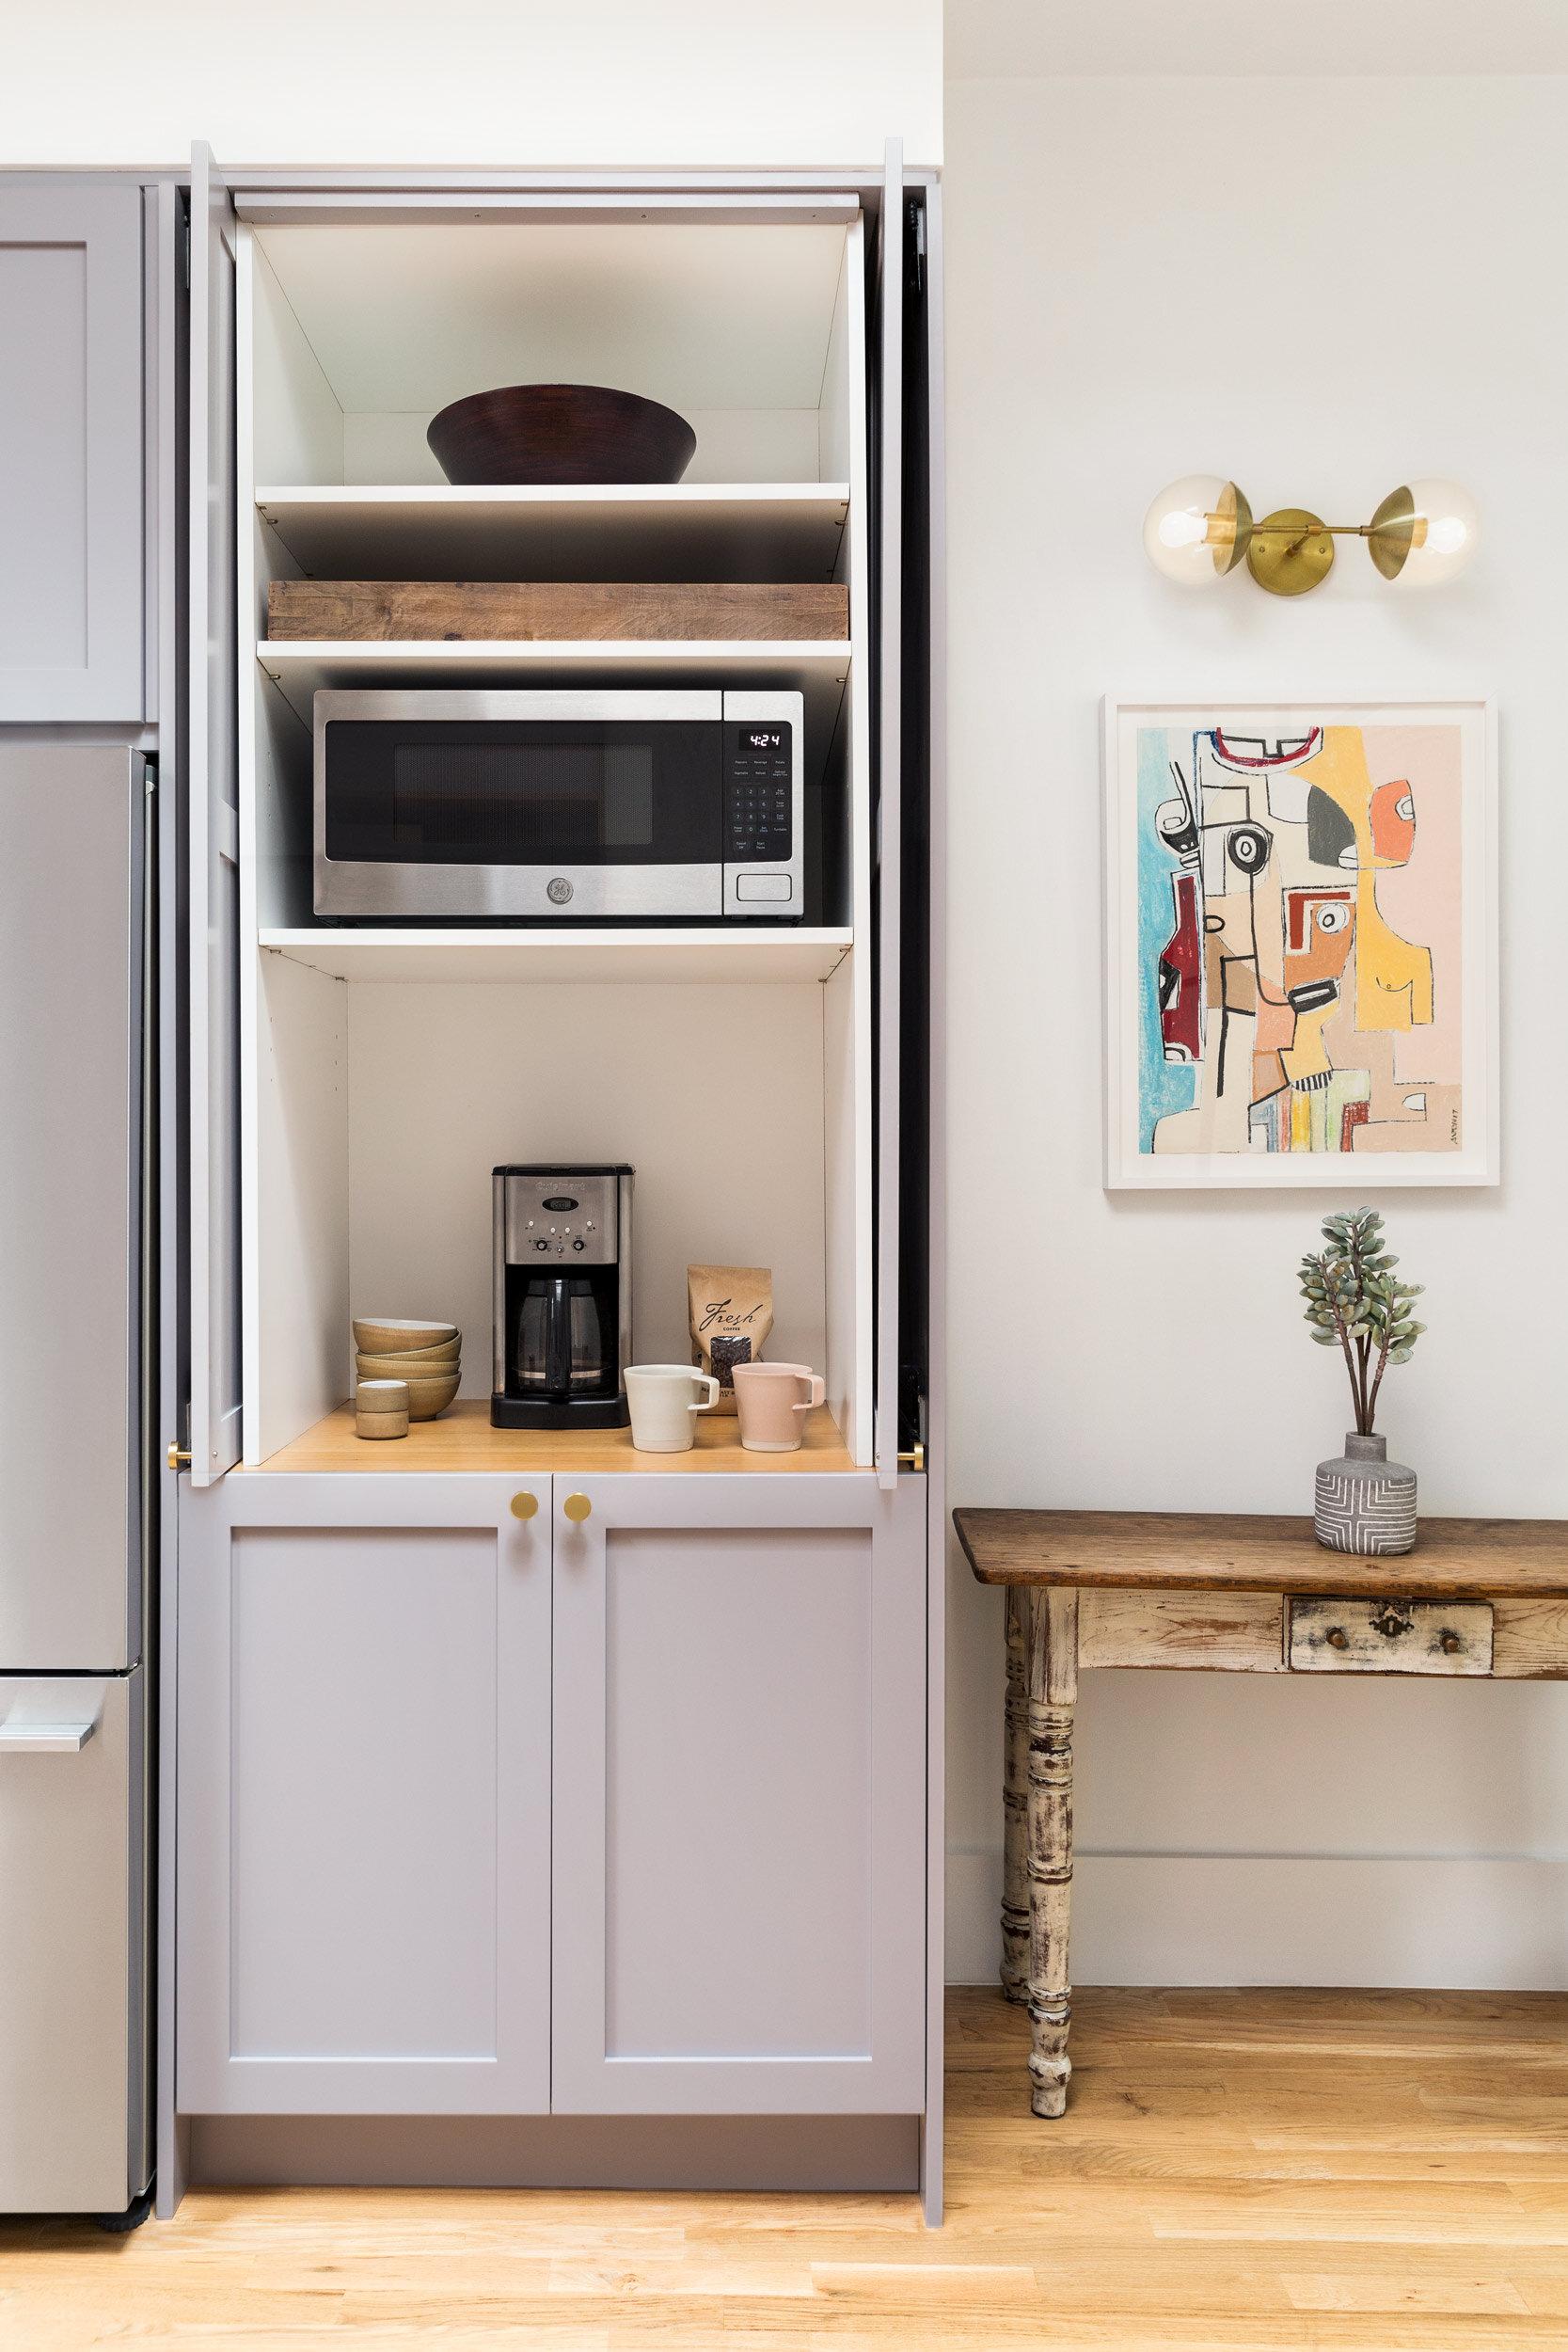 Ikea Kitchen Hacks Part 1 Pantry Doors Am Singer Design